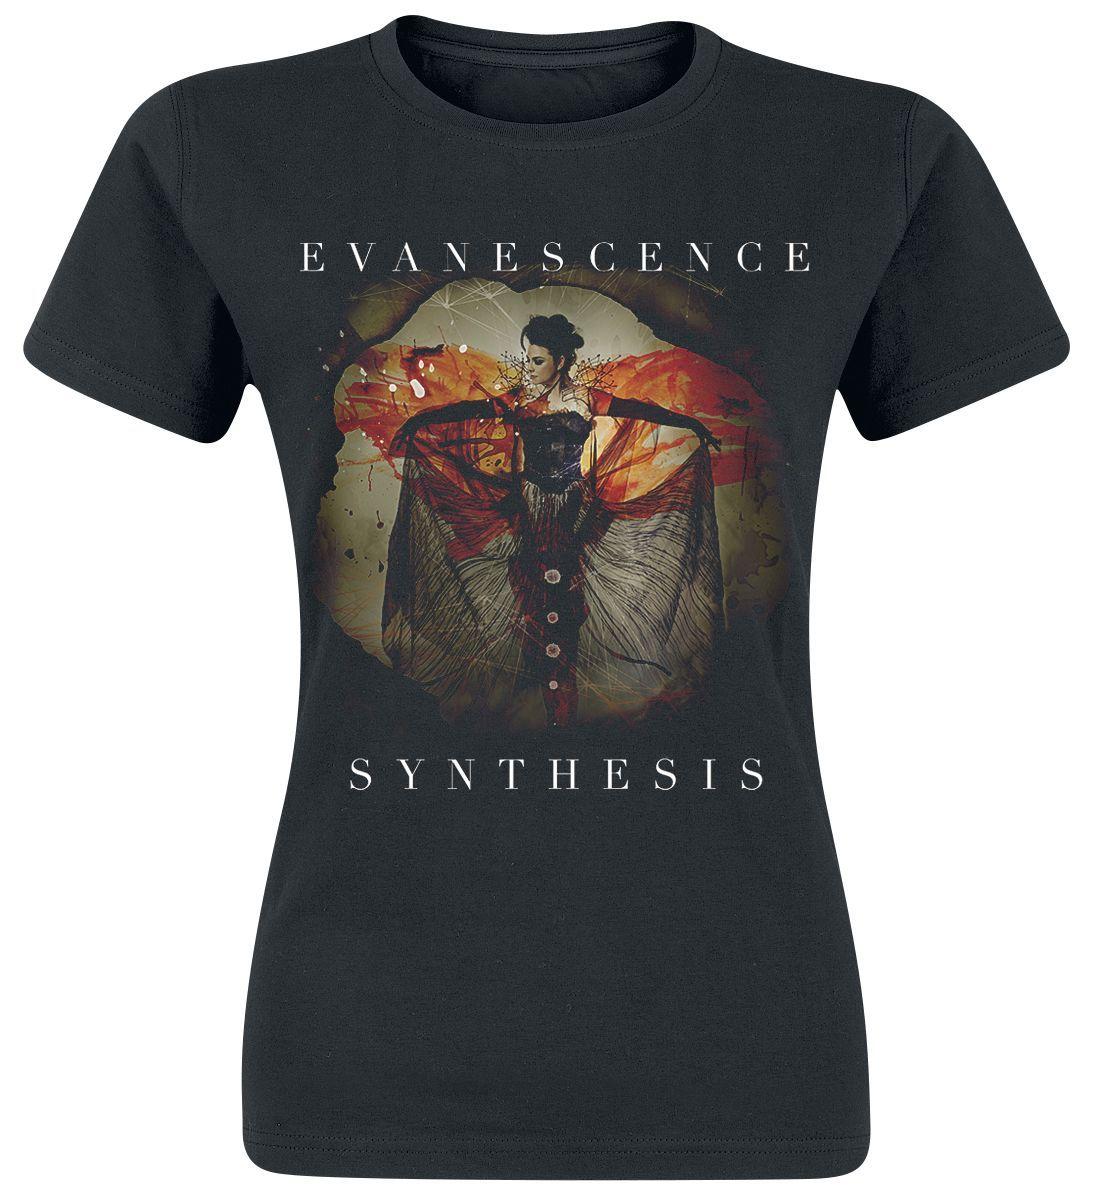 Evanescence Synthesis Girl Shirt schwarz #metal #shirts